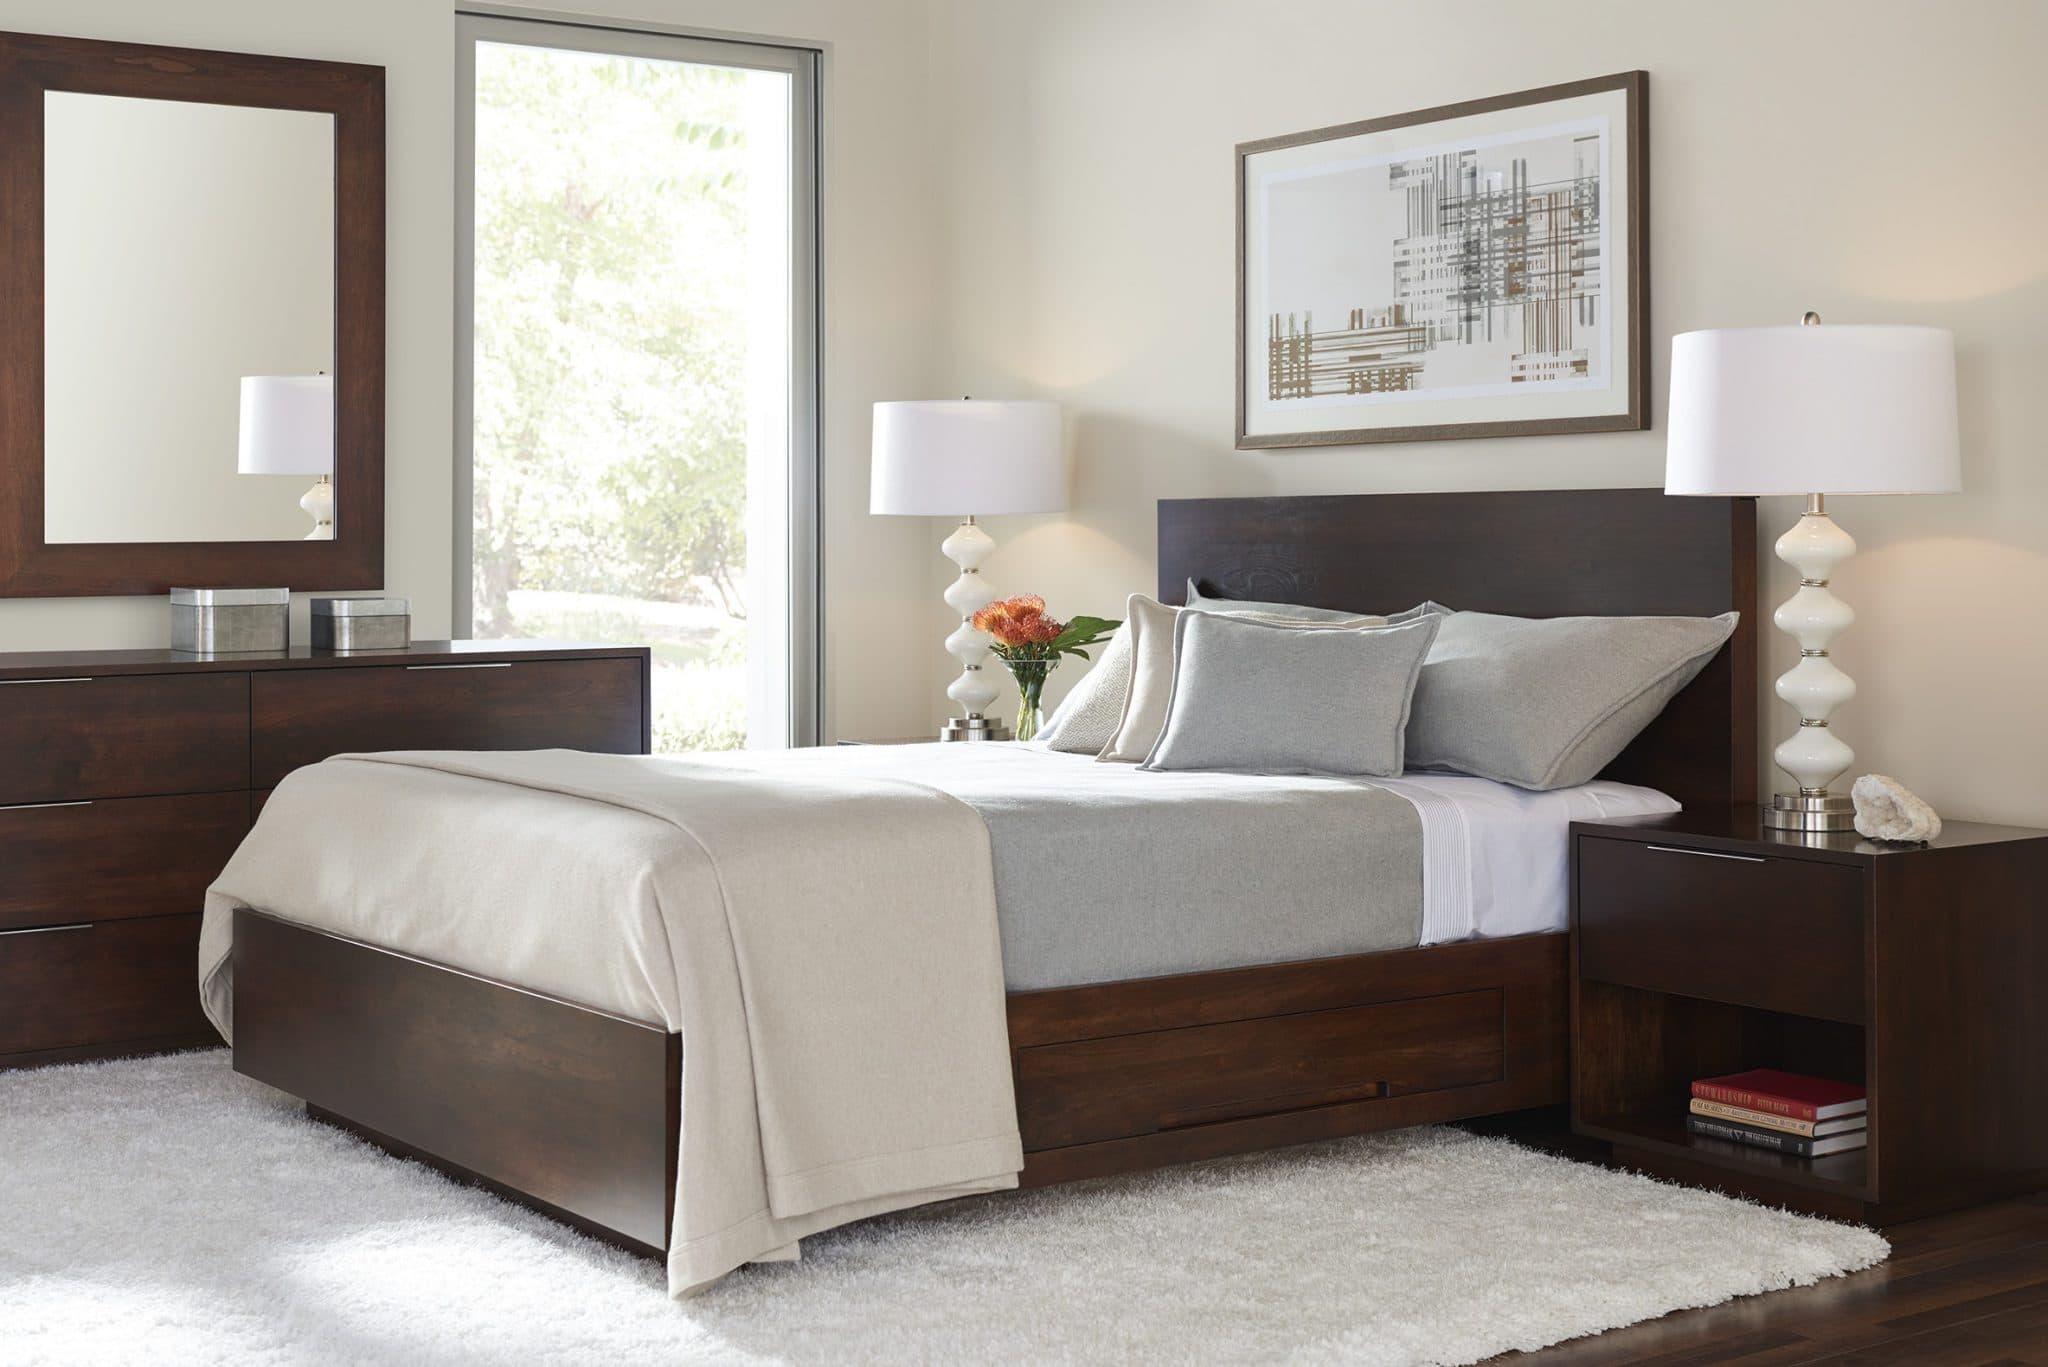 Bedroom-Tara-Bed-Gat-Creek-Minimalist.